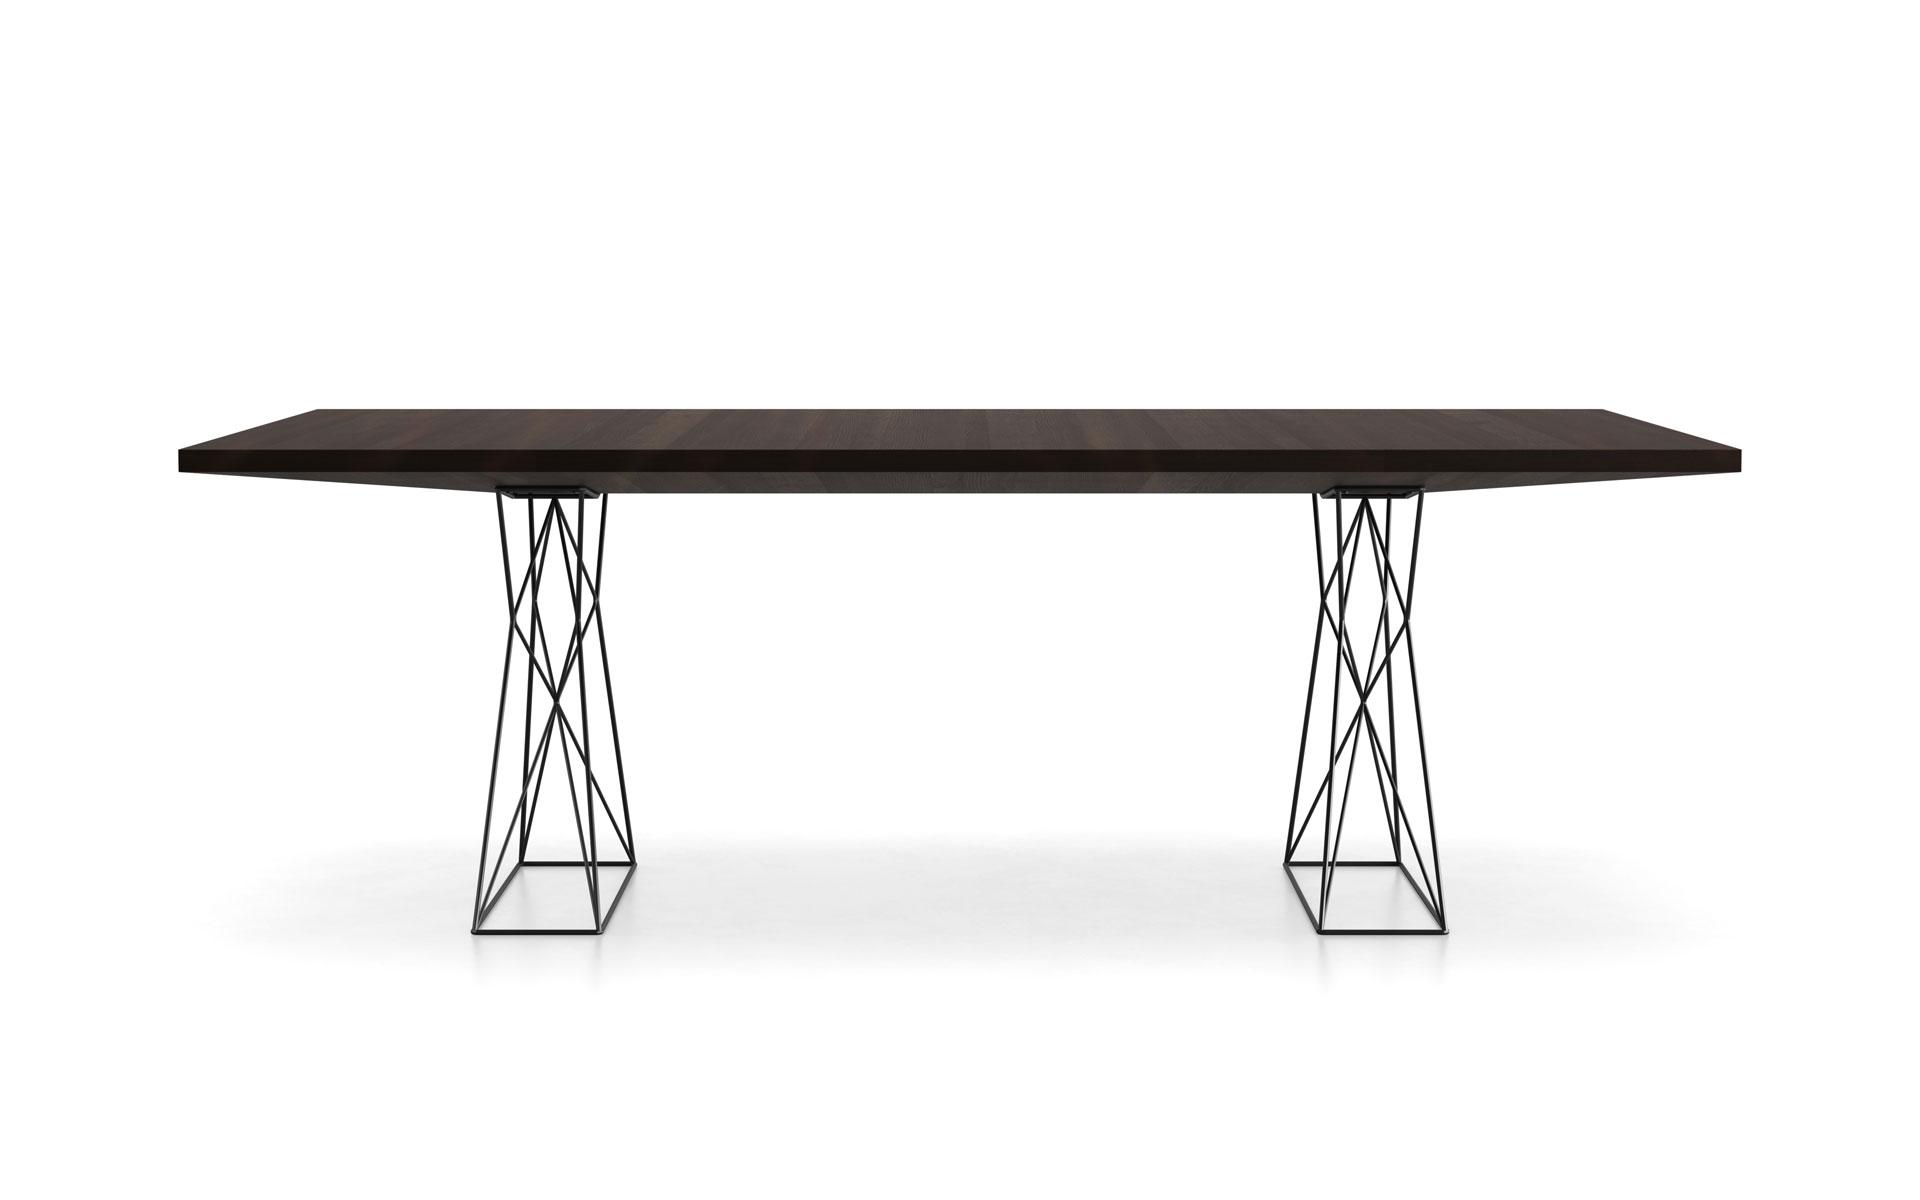 Curzon Table